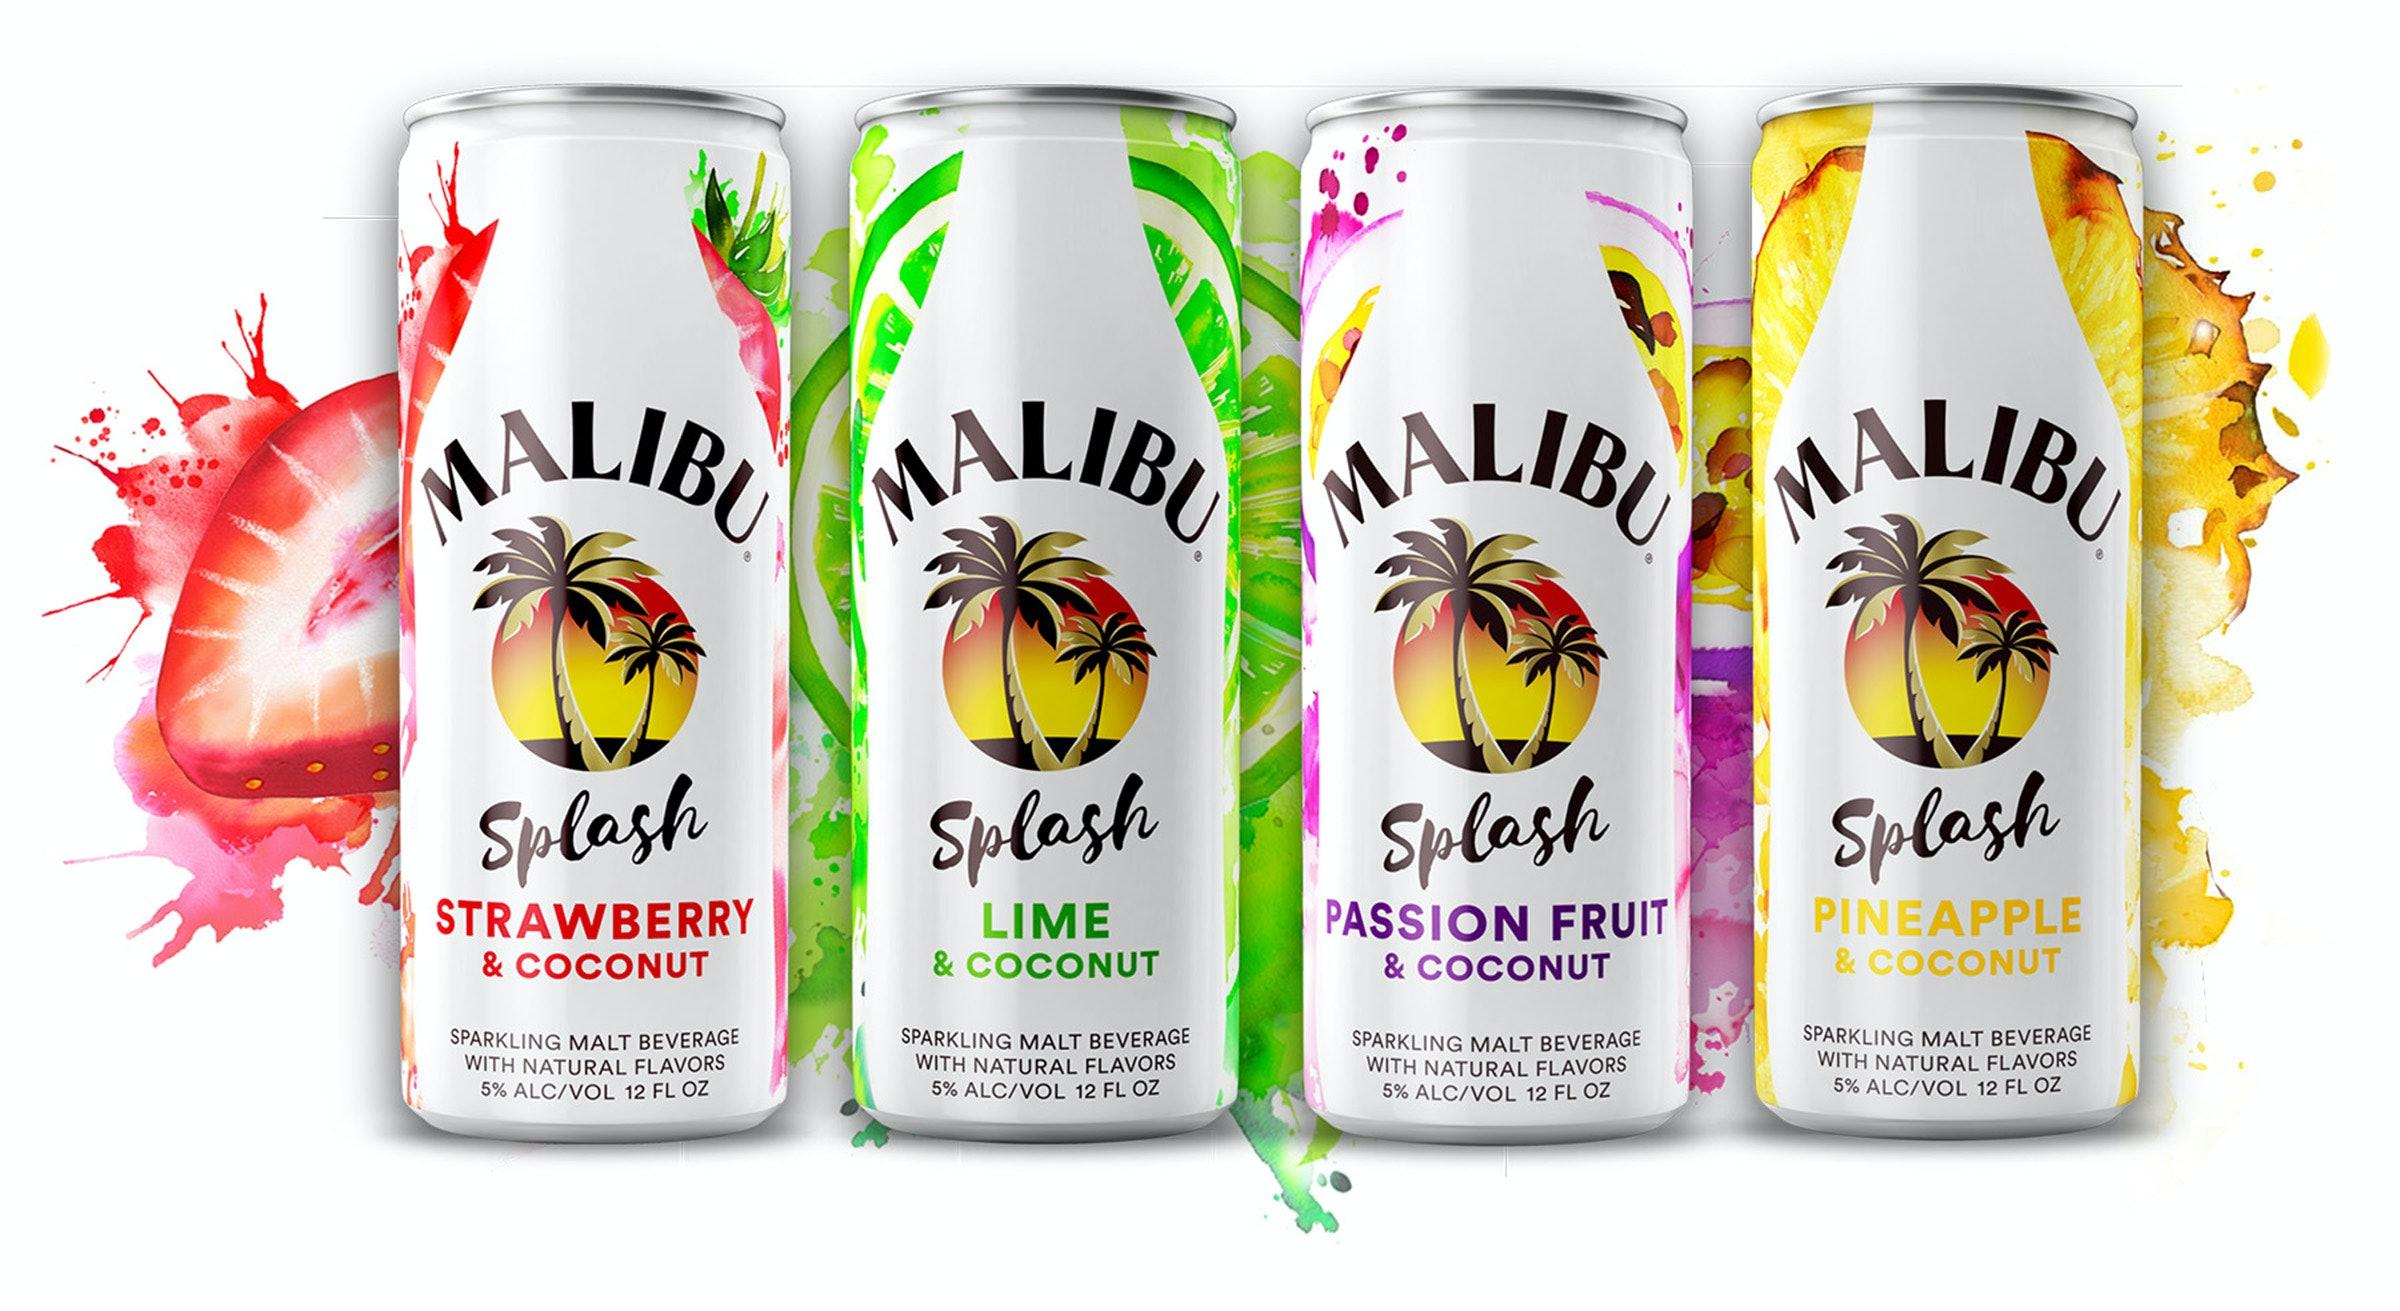 Malibu Splash Canned Cocktails